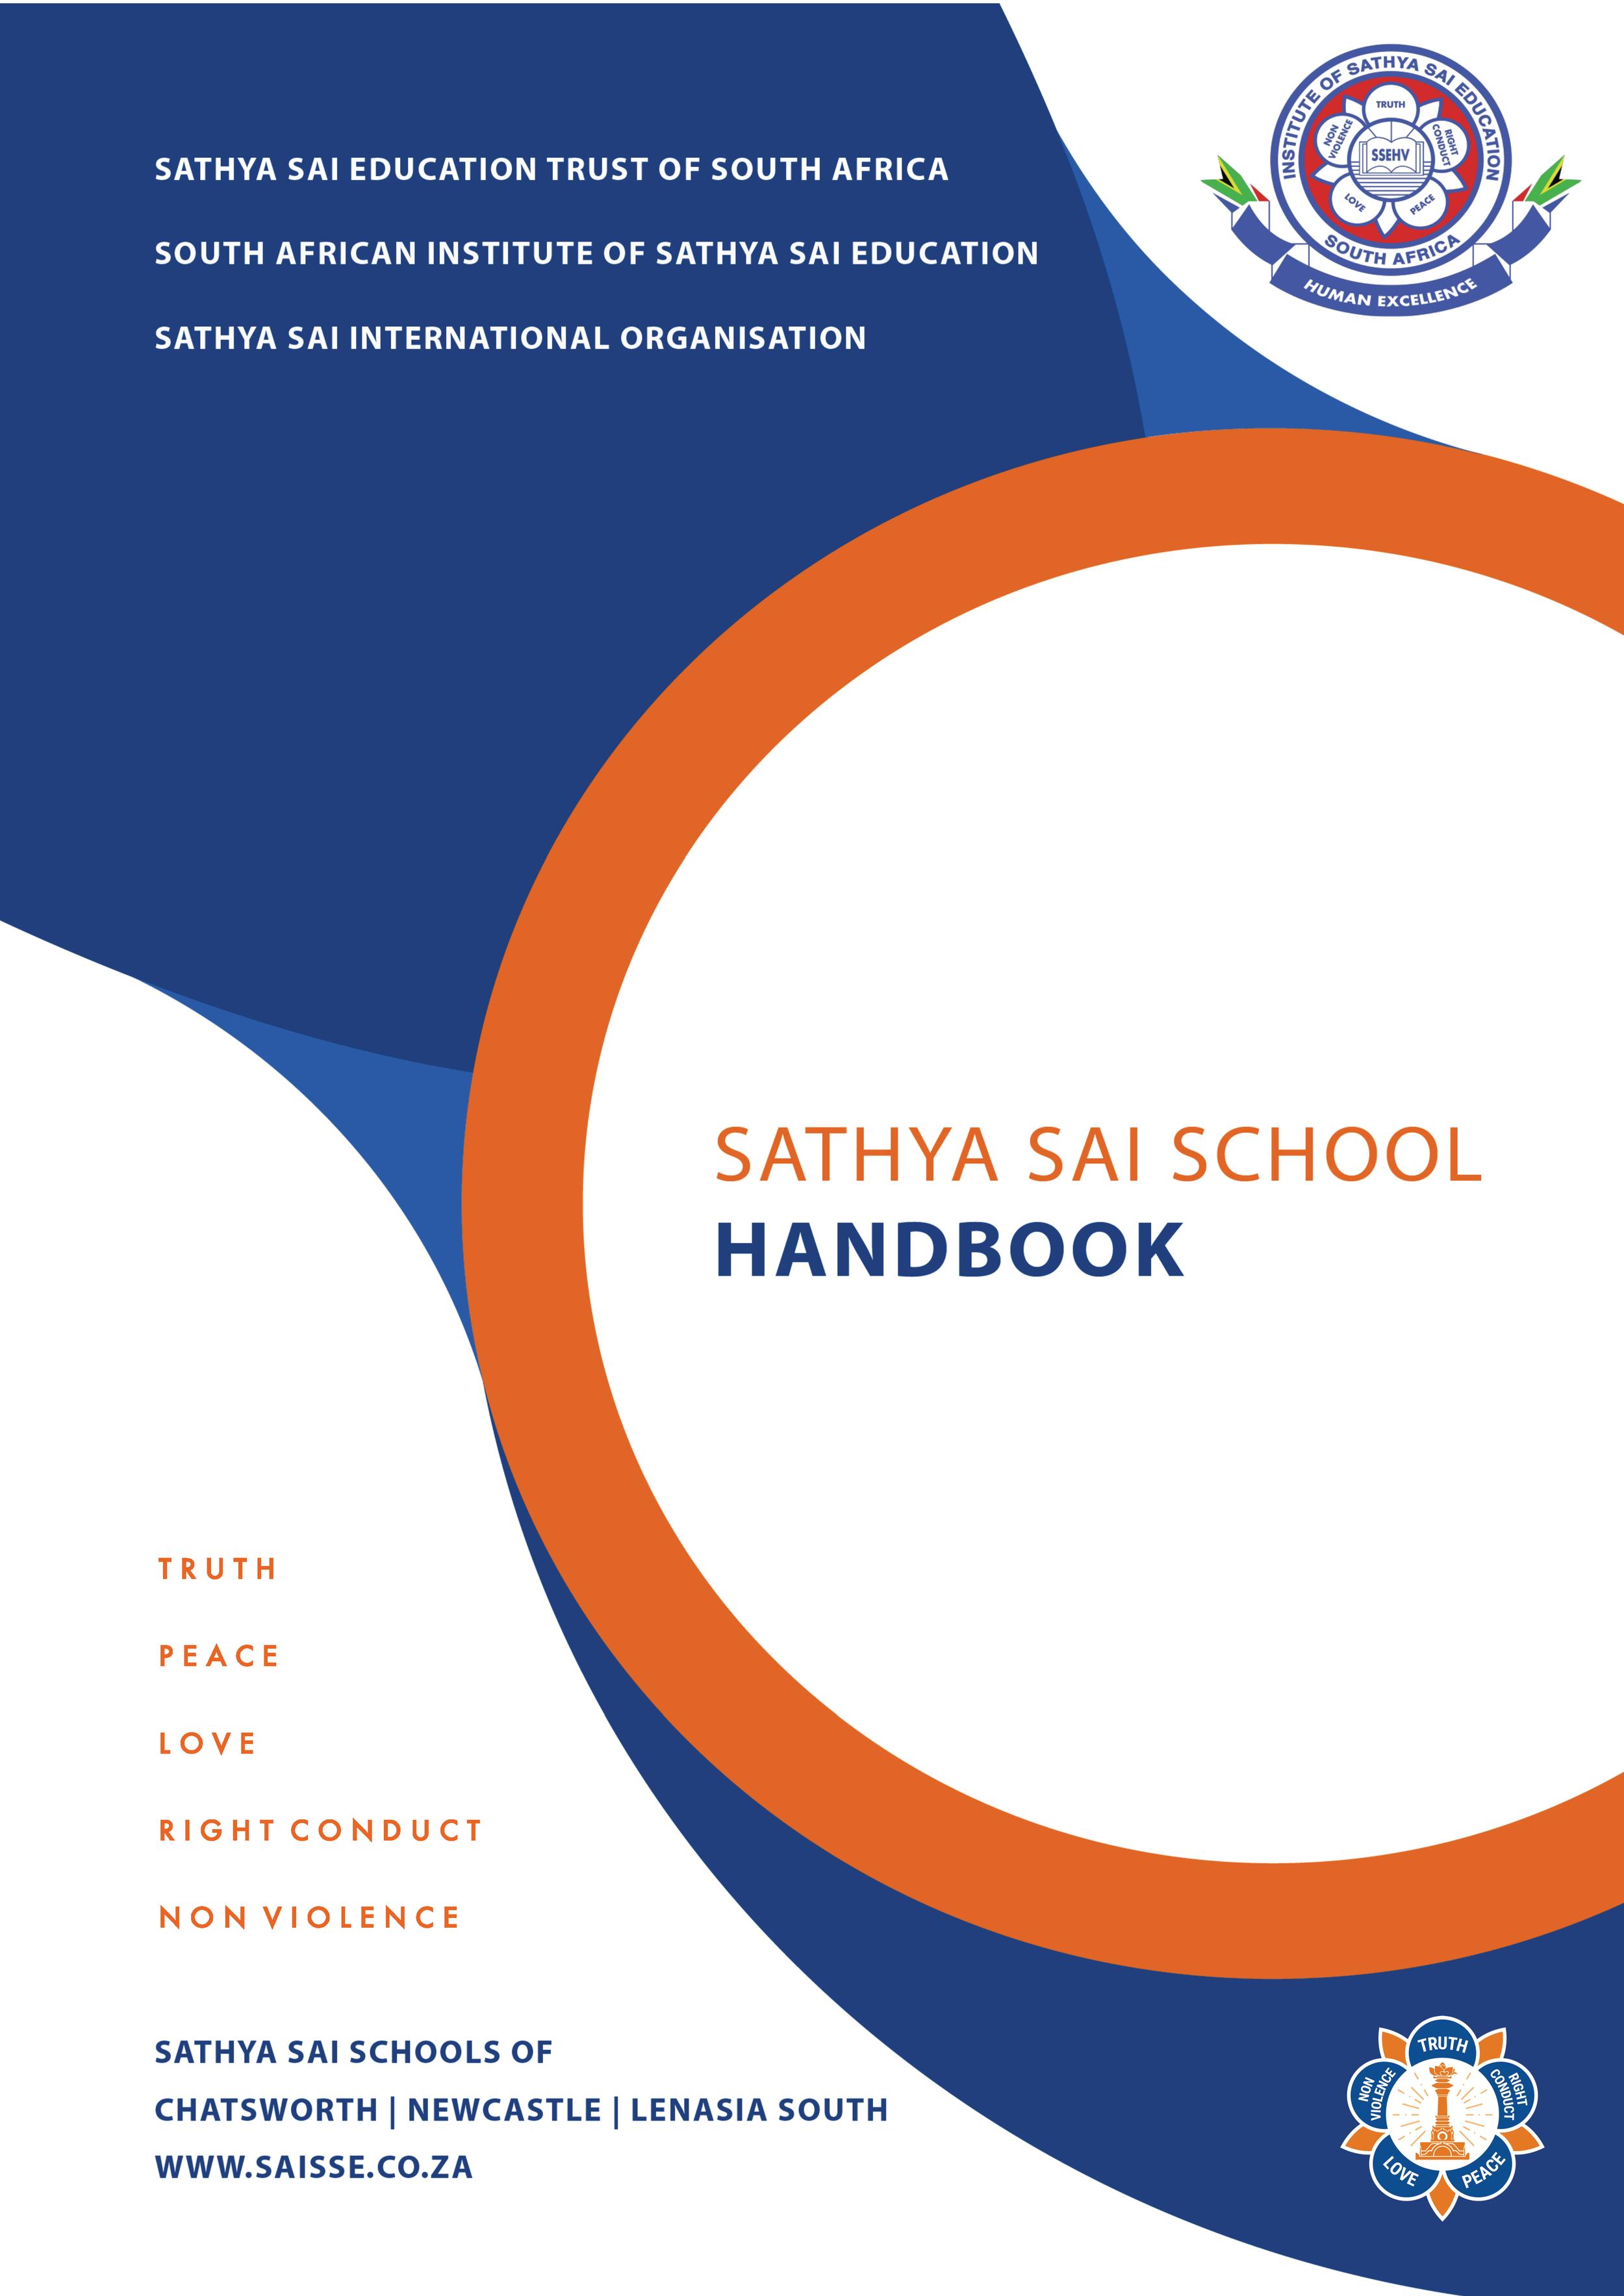 Sathya Sai School Handbook.png